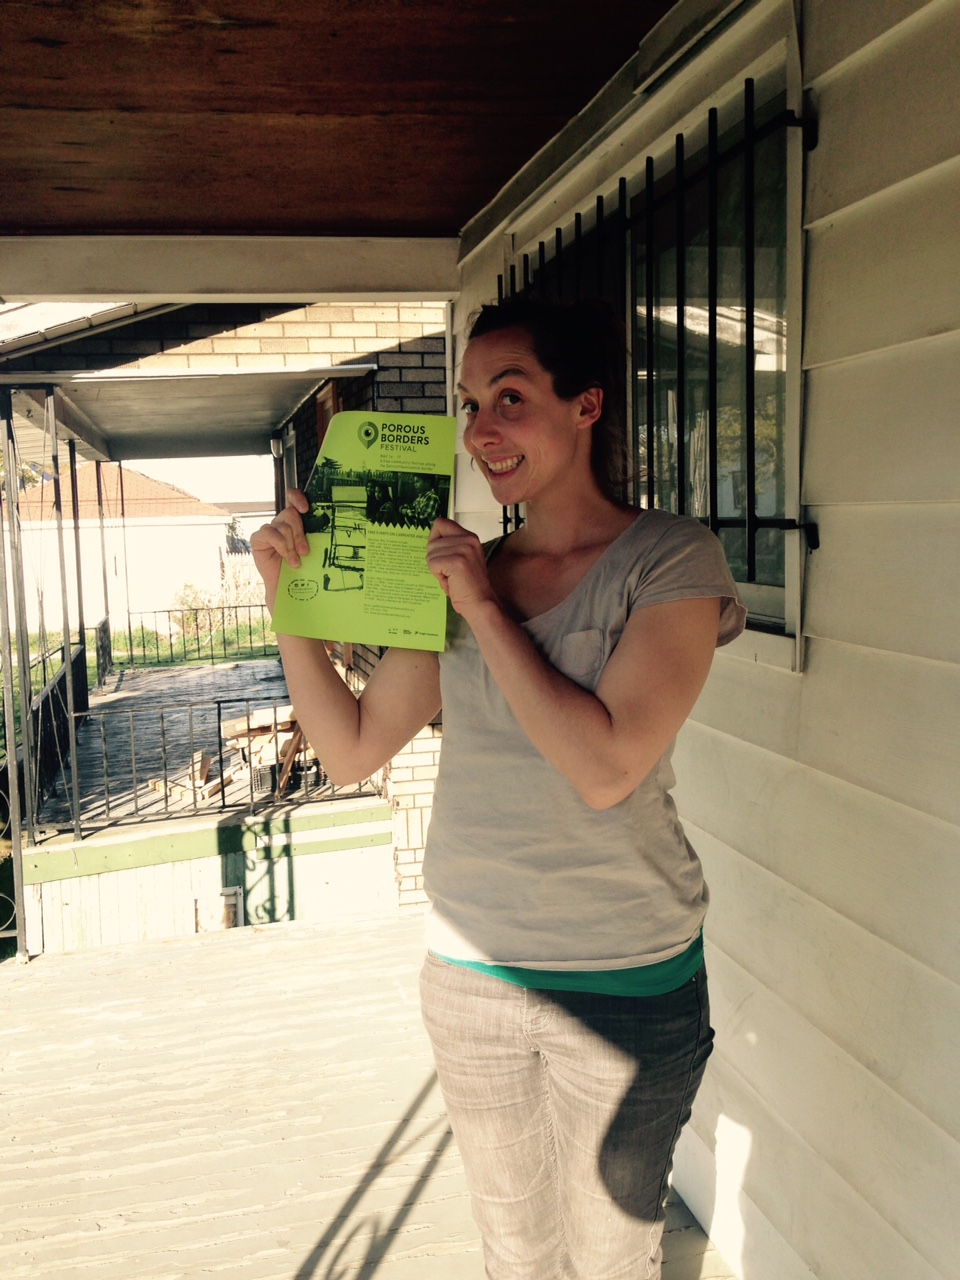 Liza Bielby holding a Porous Borders flyer